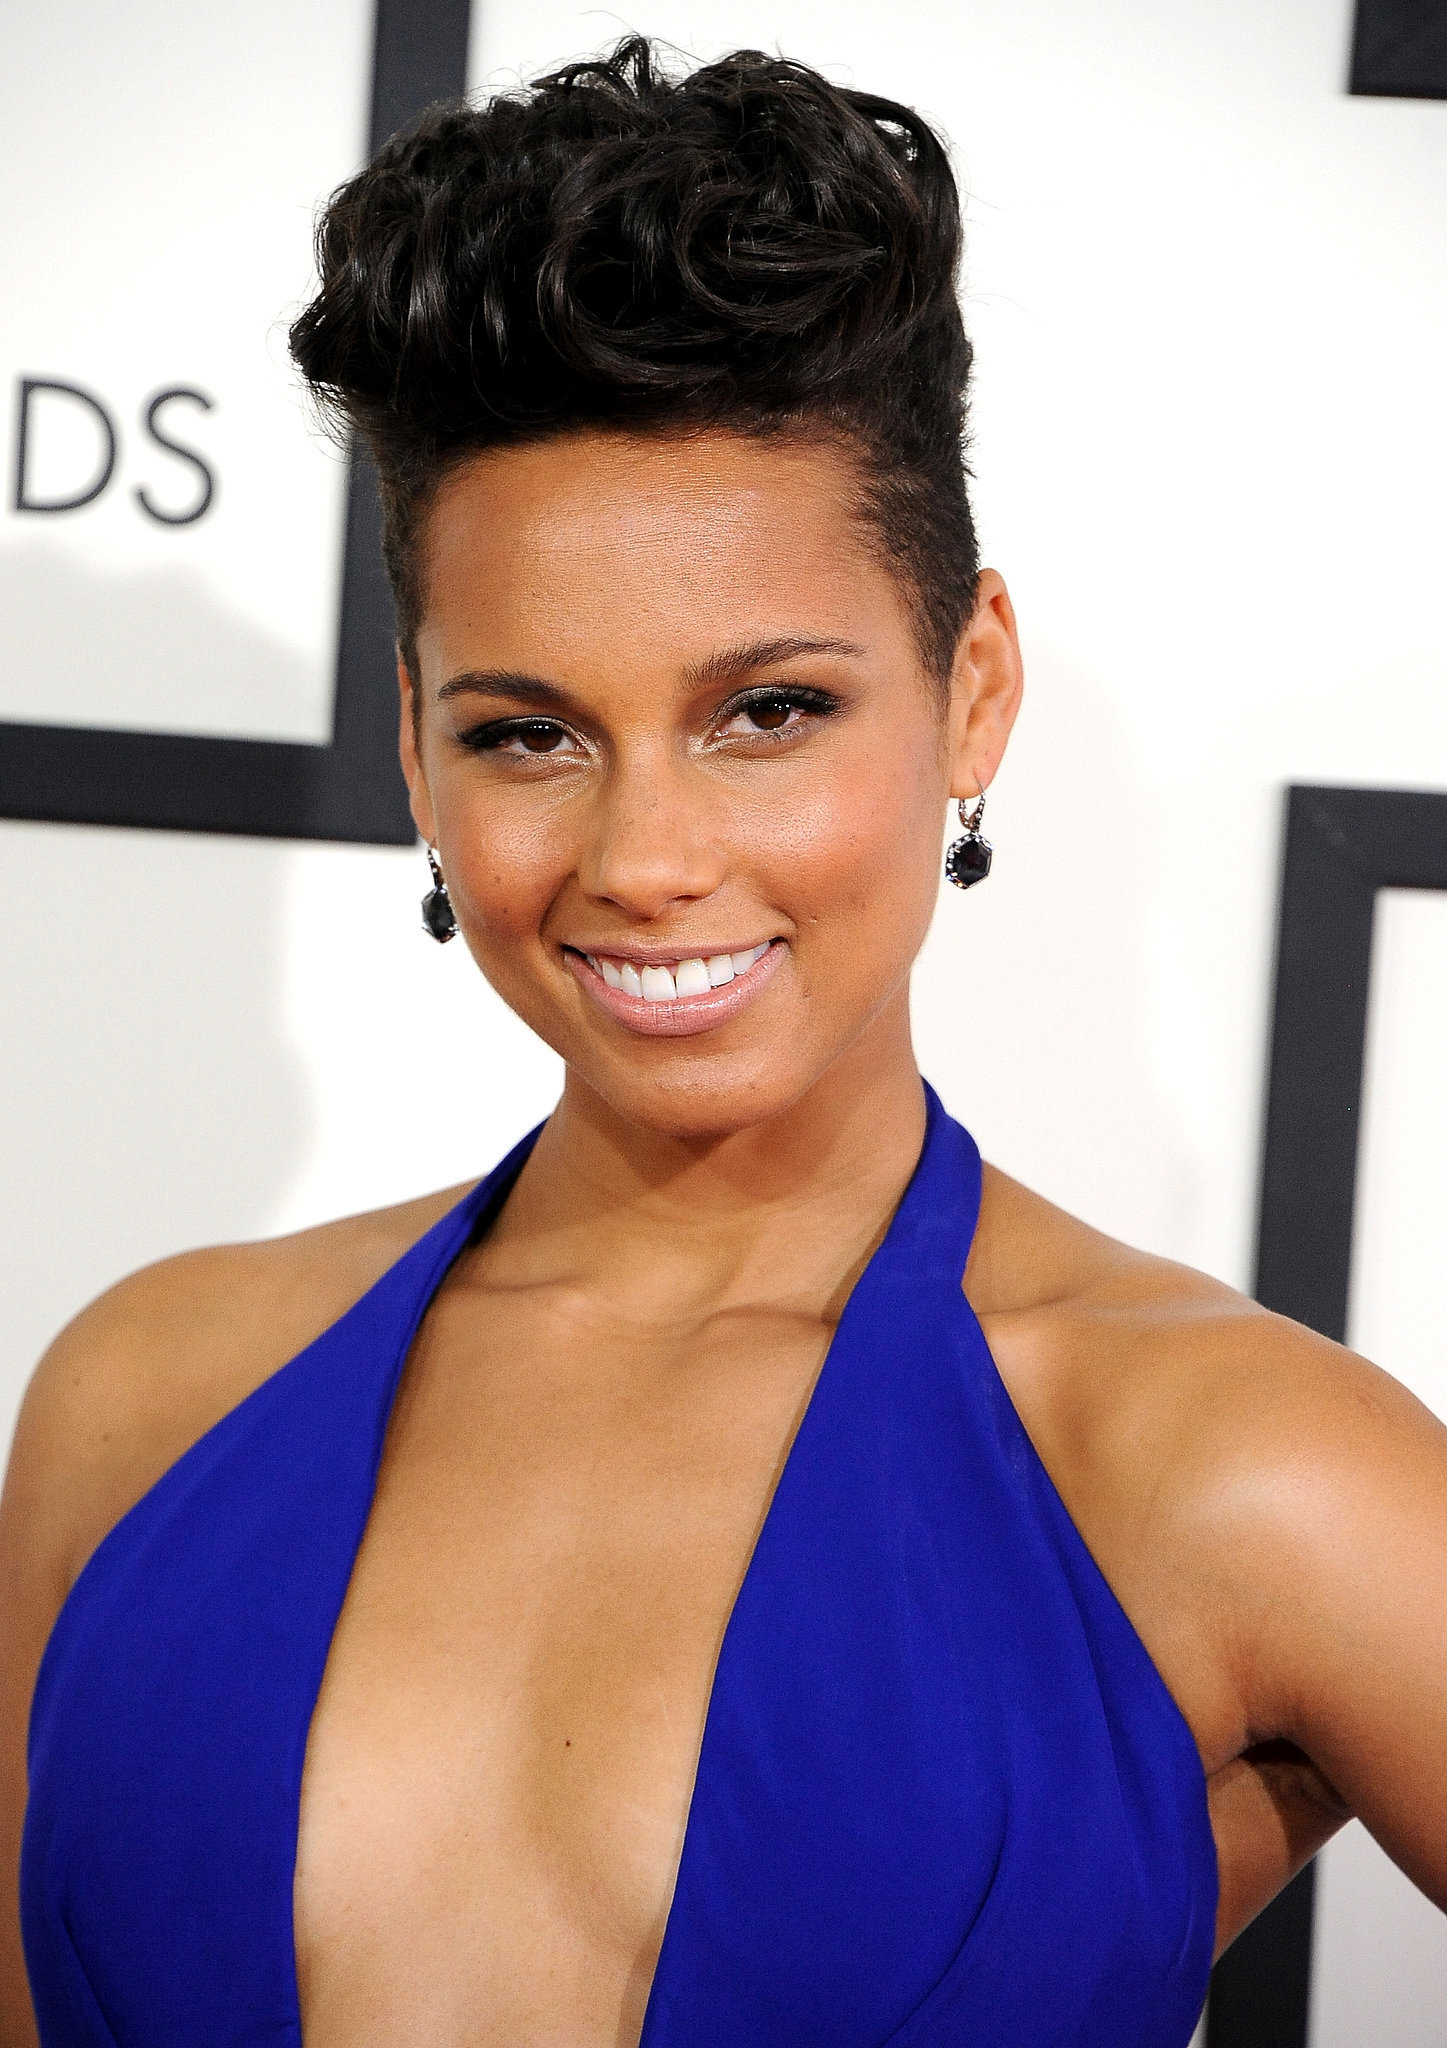 Alicia Keys's Hair and Makeup at the Grammys 2014 | POPSUGAR Beauty